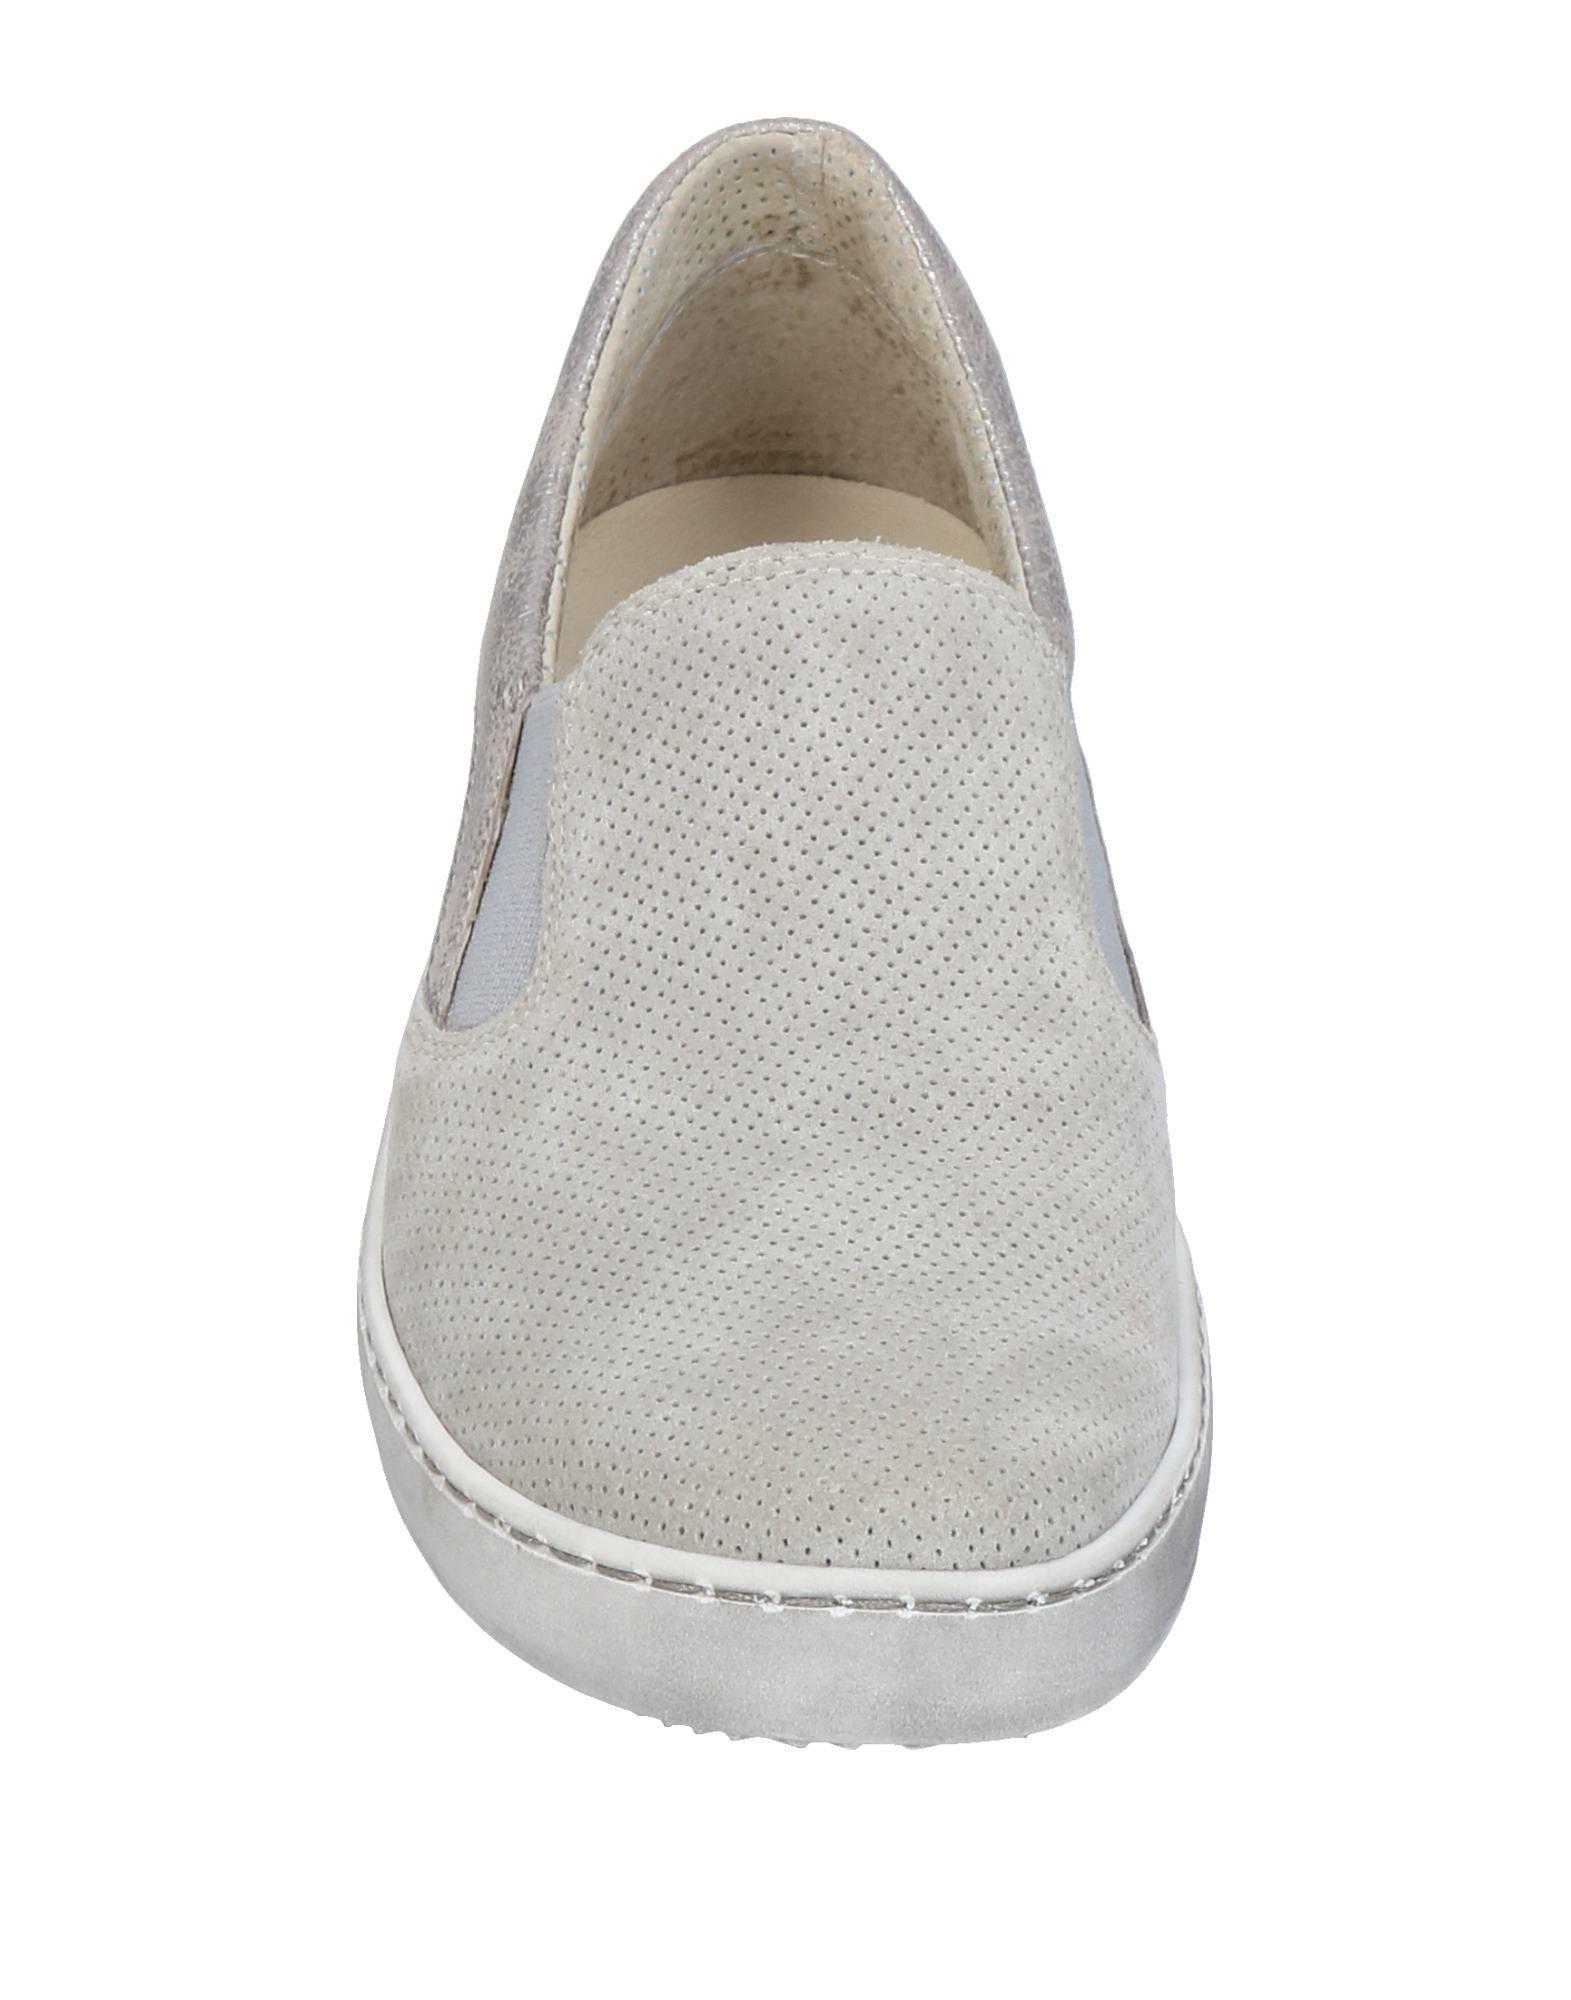 Novelty Suede Low-tops & Sneakers in Light Grey (Grey)